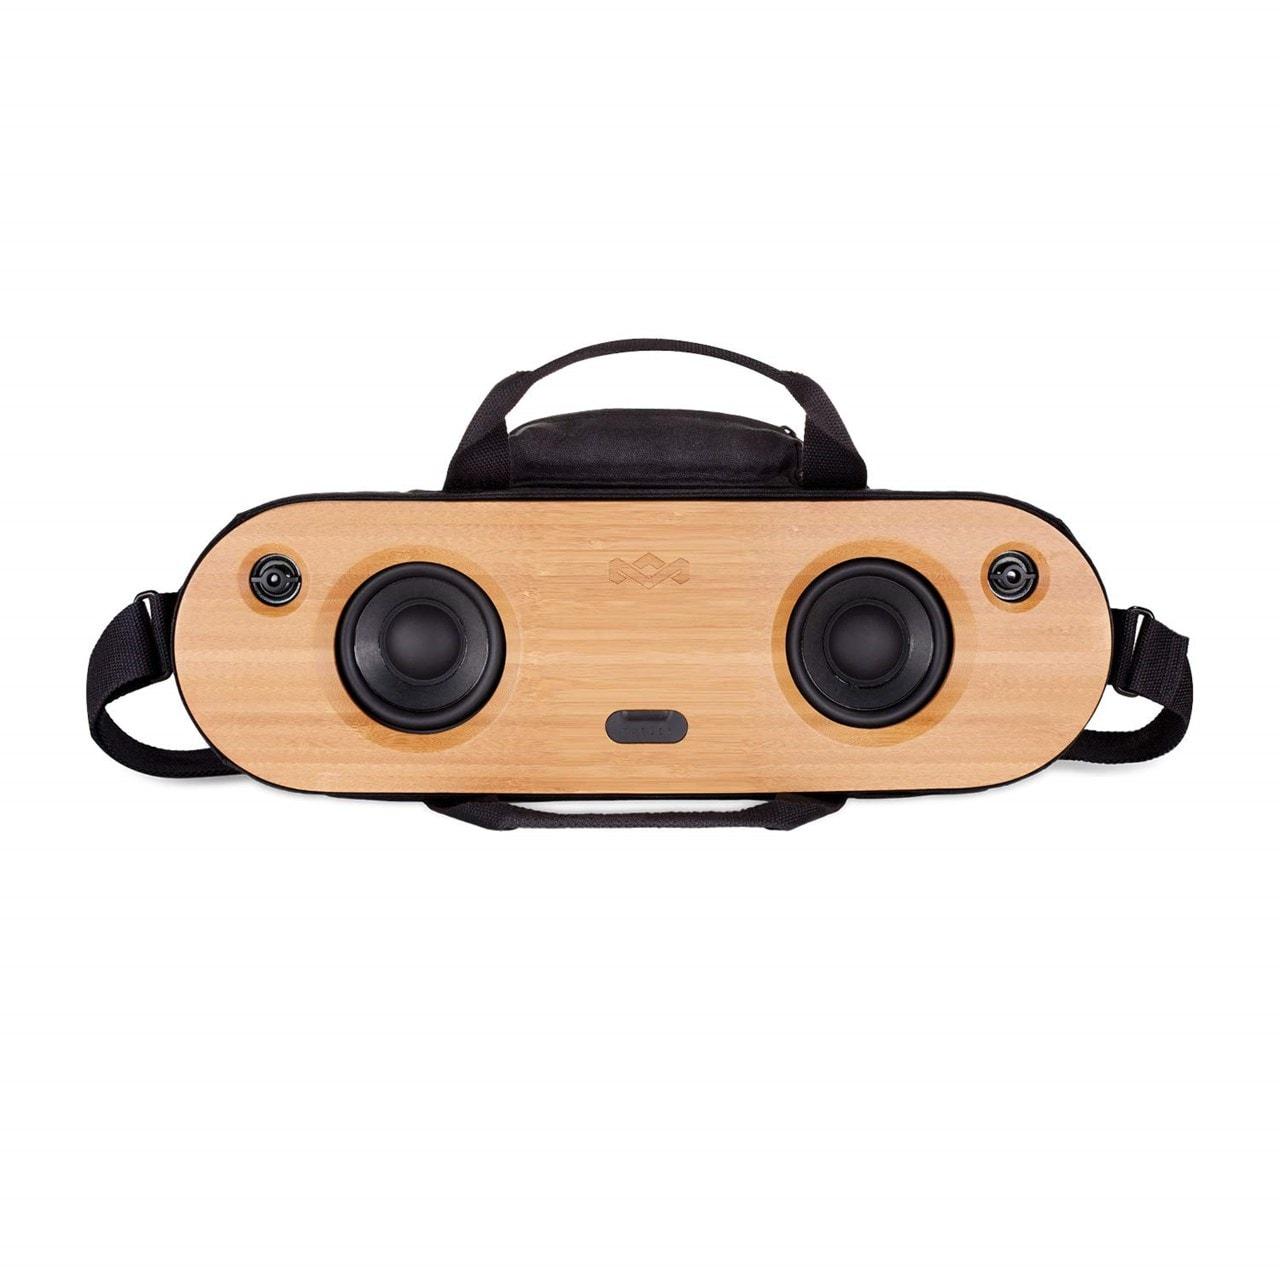 House Of Marley Bag Of Riddim 2 Bluetooth Speaker - 1